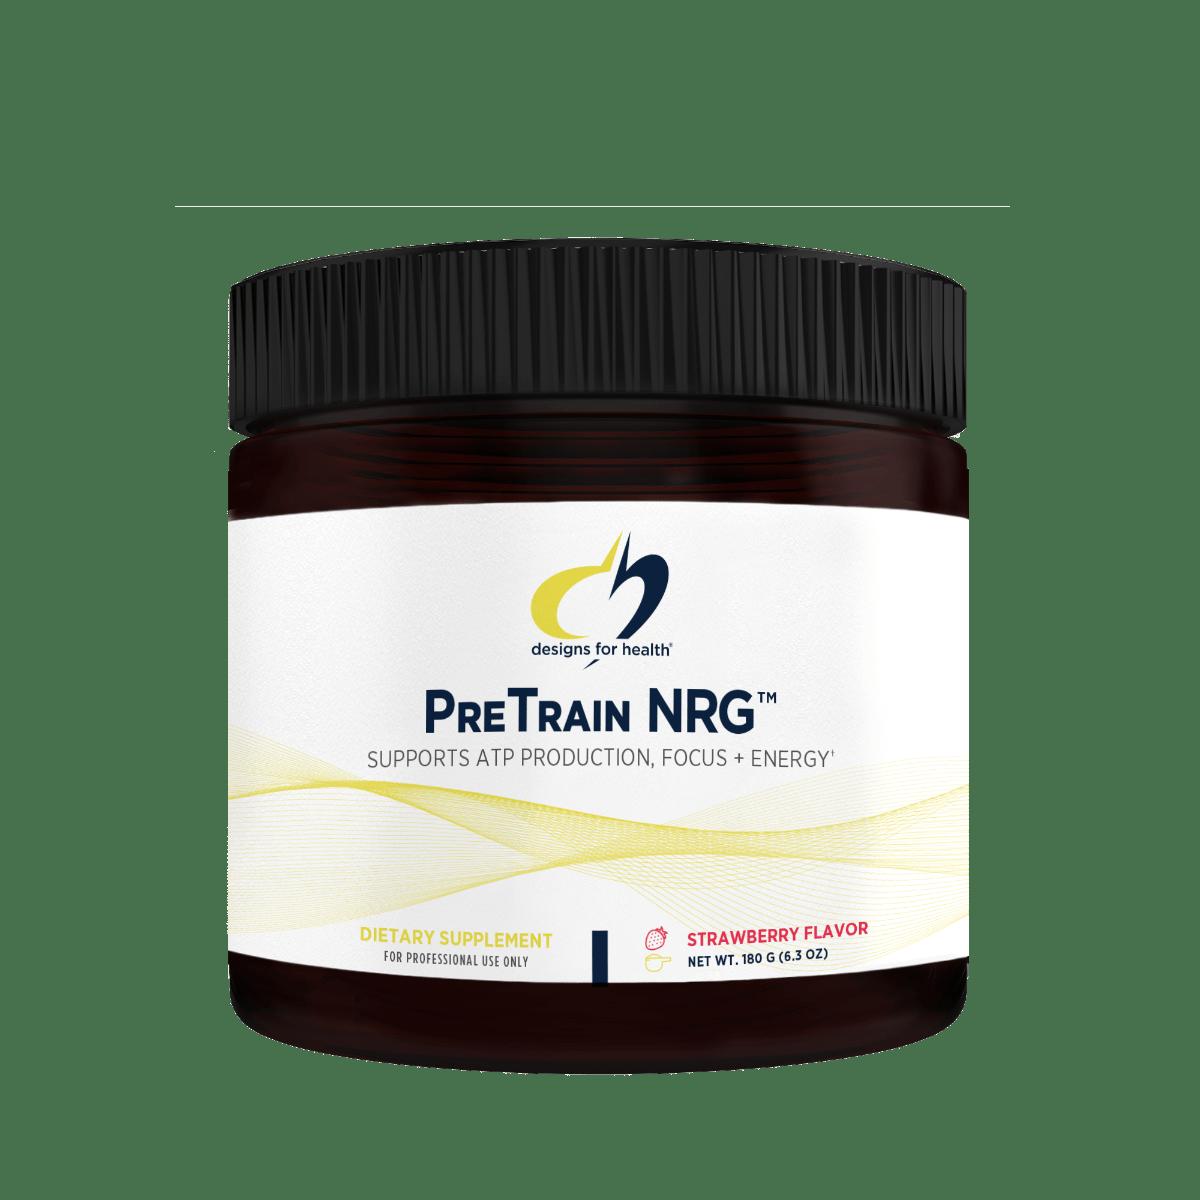 PreTrain NRG 180 g (6.3 oz) Designs for Health